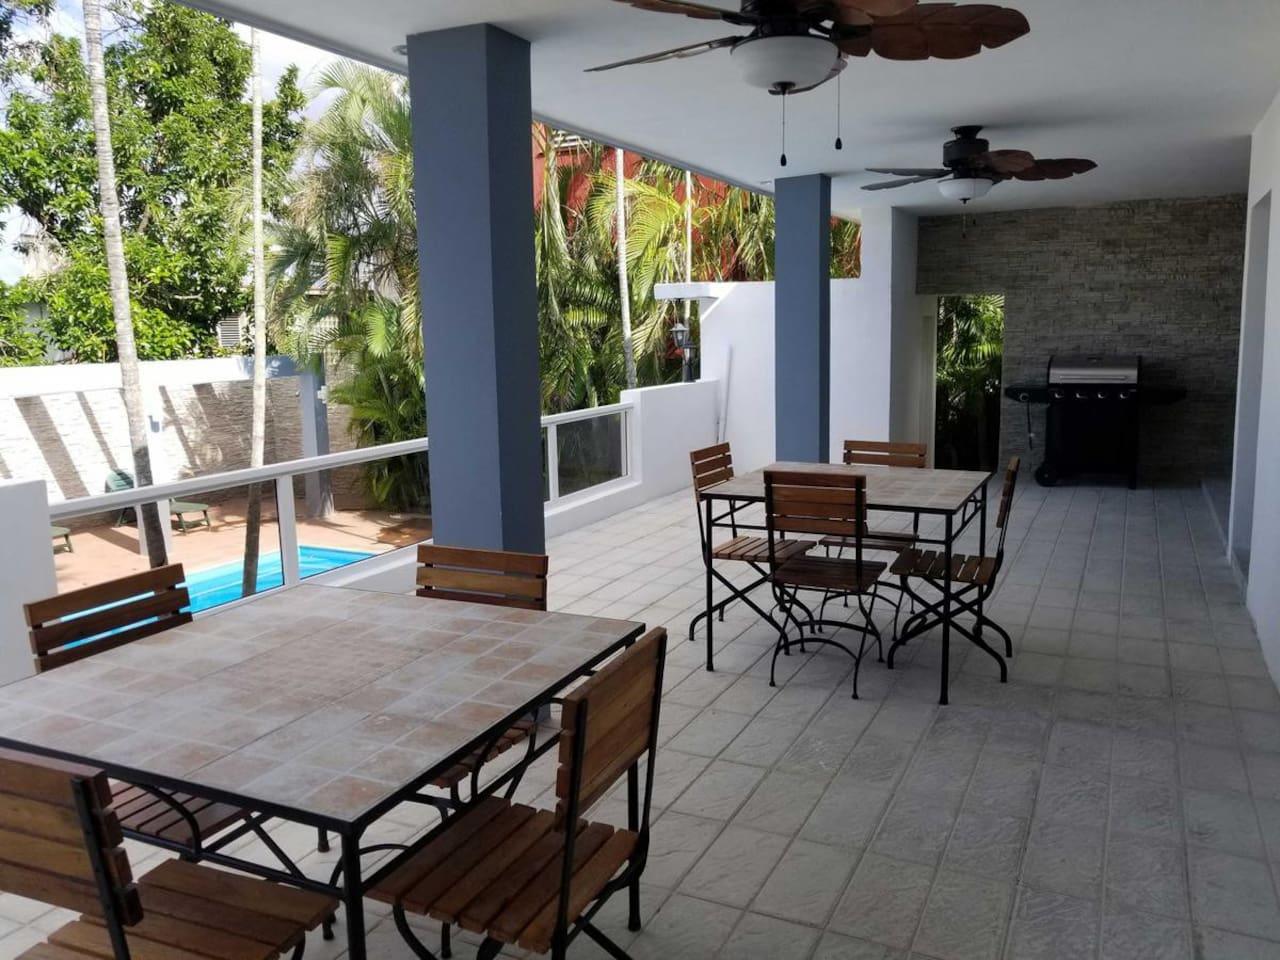 Villa Don Teto Suite & 8 Rooms: Great Havana View photo 5787878